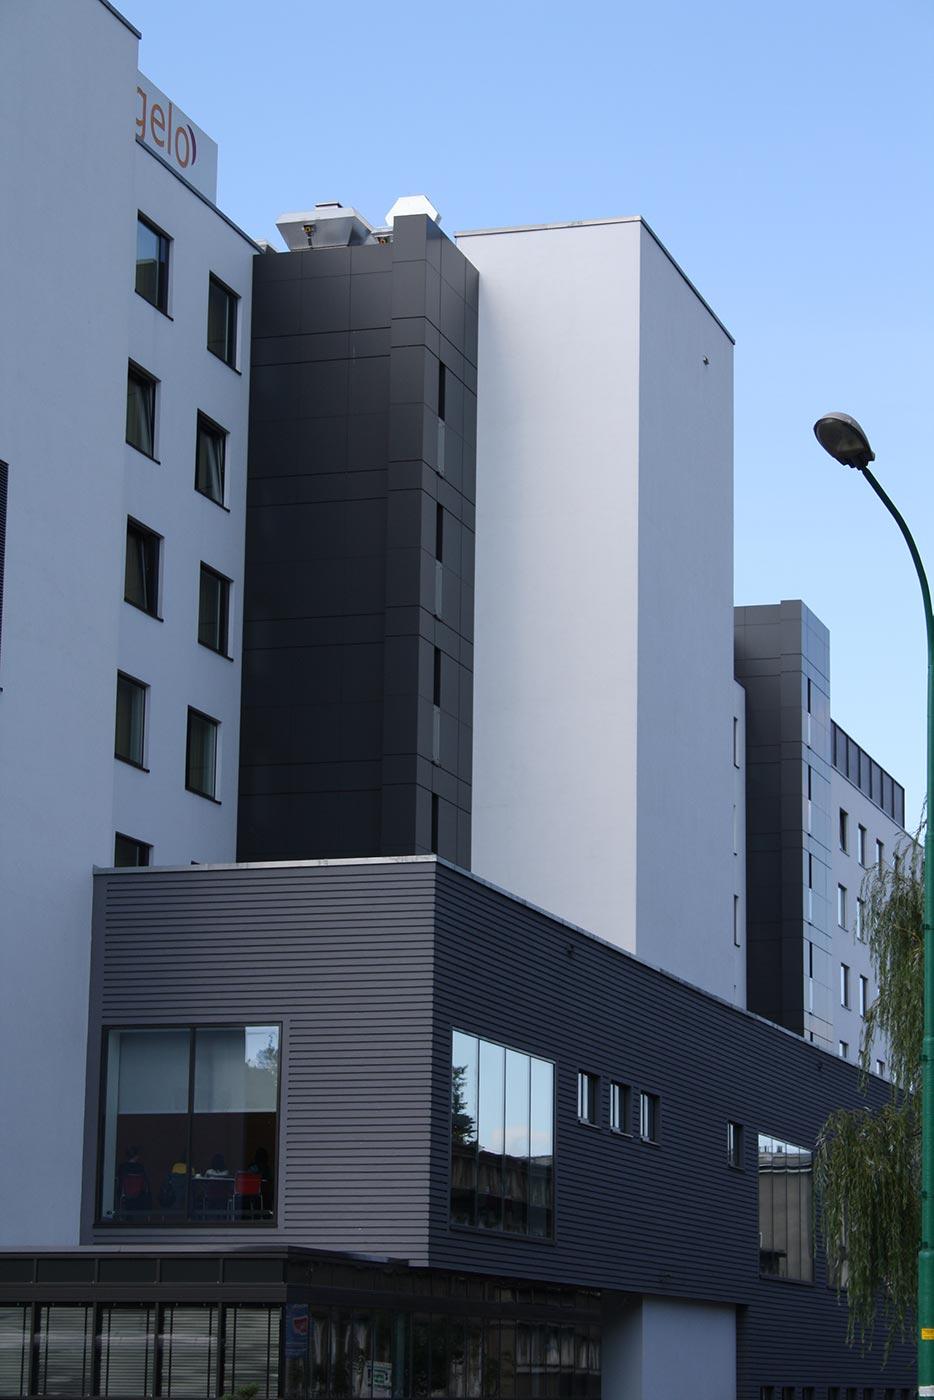 Hotel-Angelo.-Katowice-Polonia.-larson-fr-umbra-grey-2_1592301172.jpg